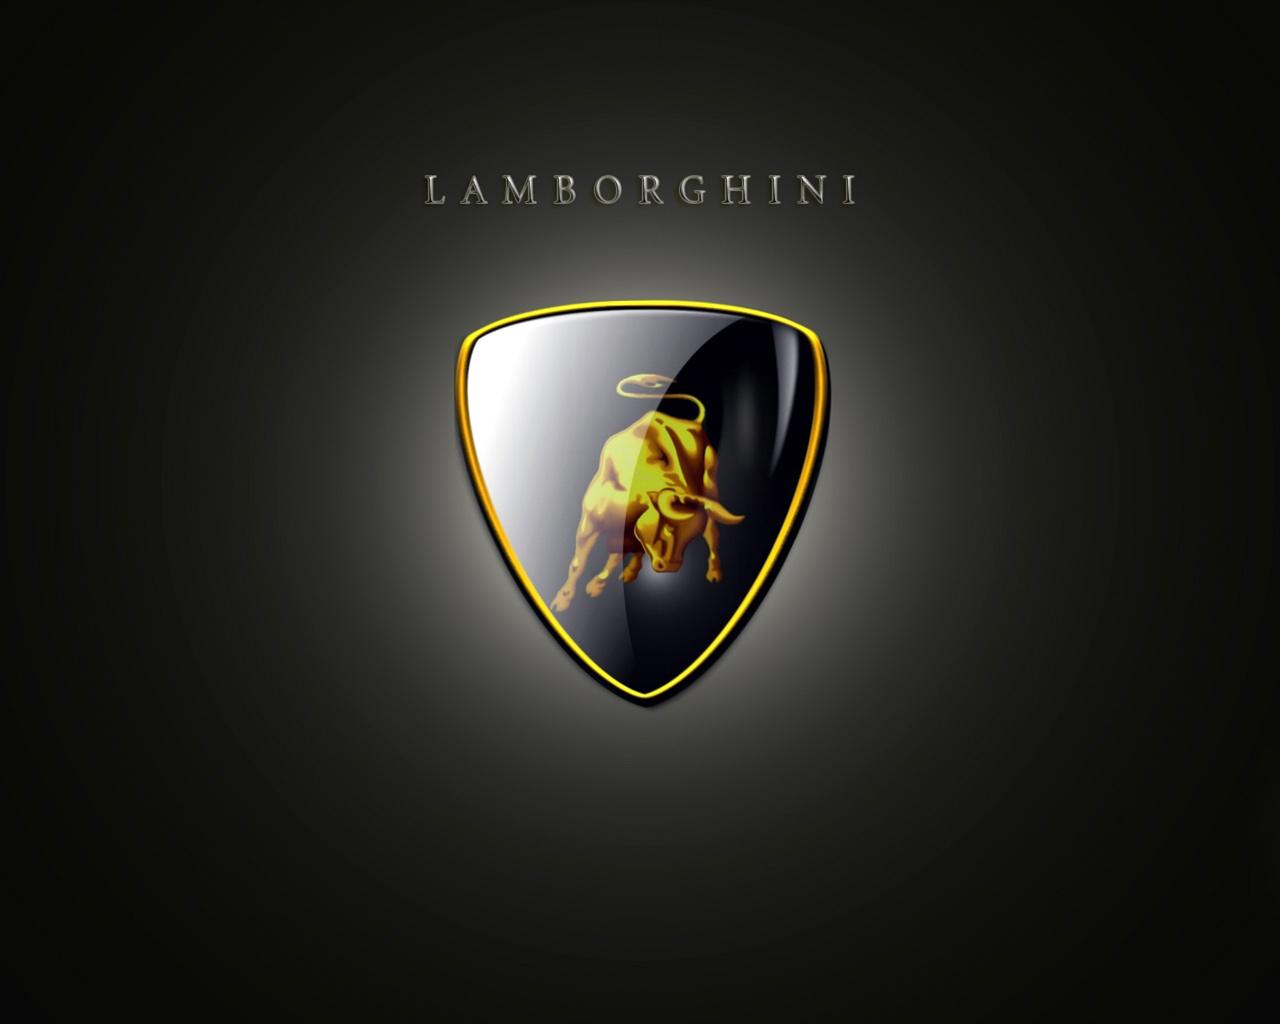 72] Lamborgini Logo Wallpaper on WallpaperSafari 1280x1024